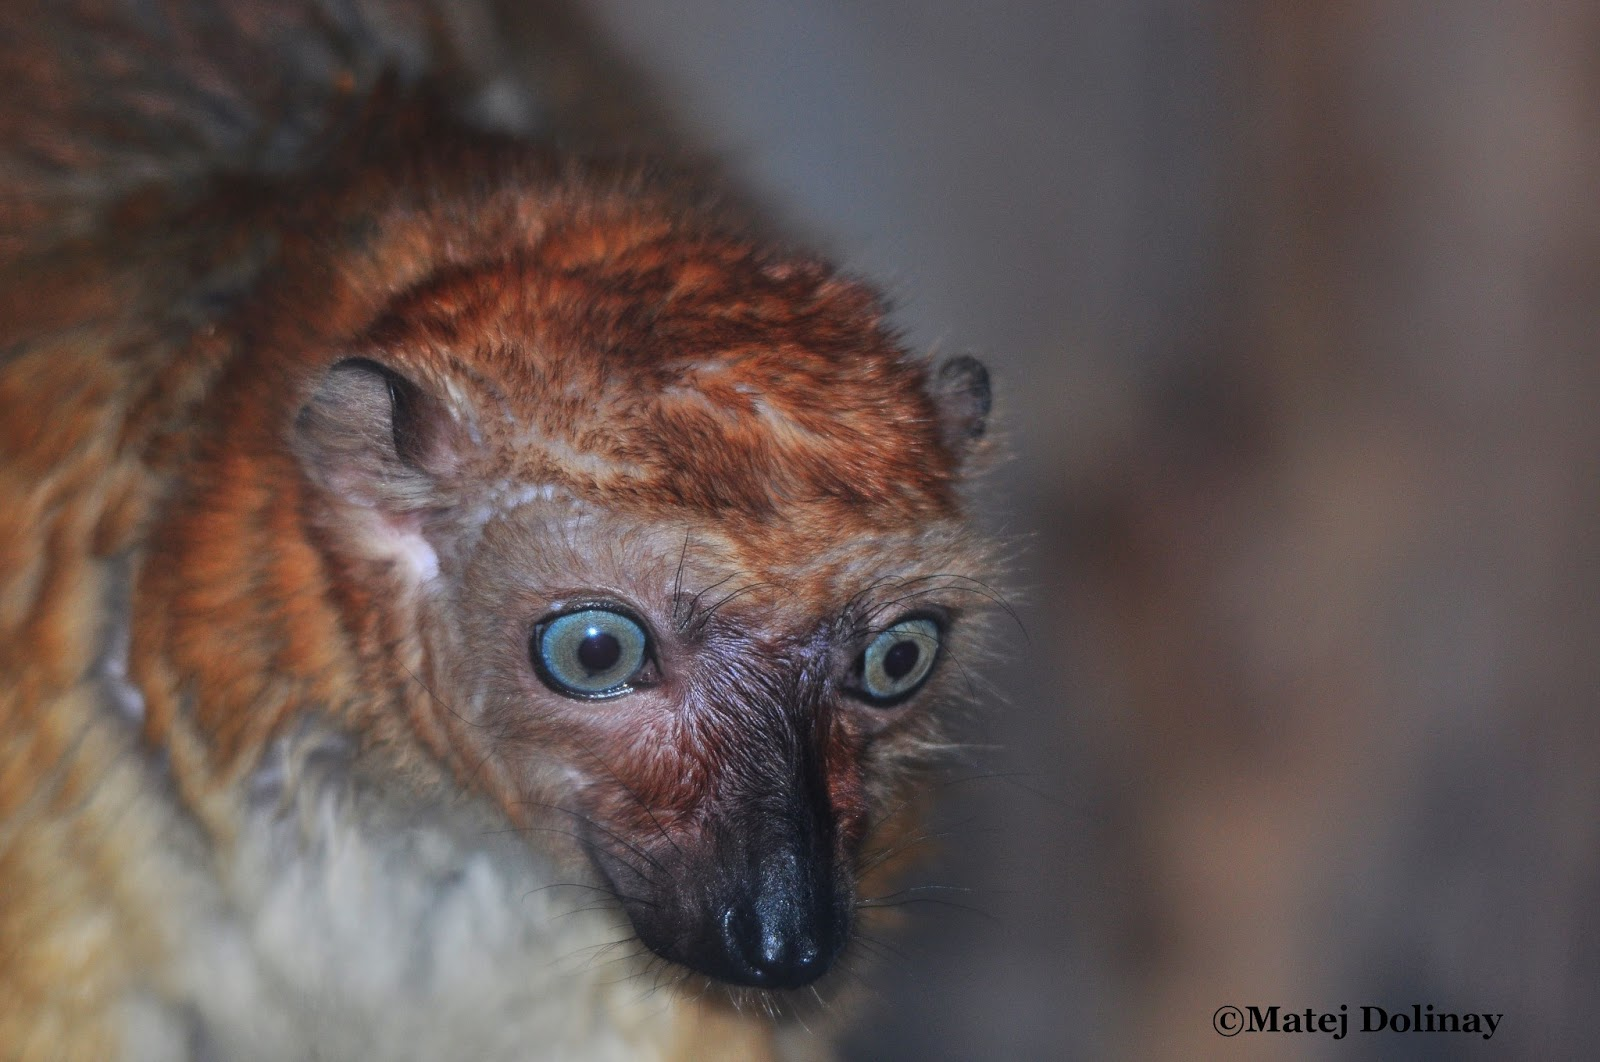 Evolutionary Vertebrate Zoology Evolucni Specialisti Na Planete